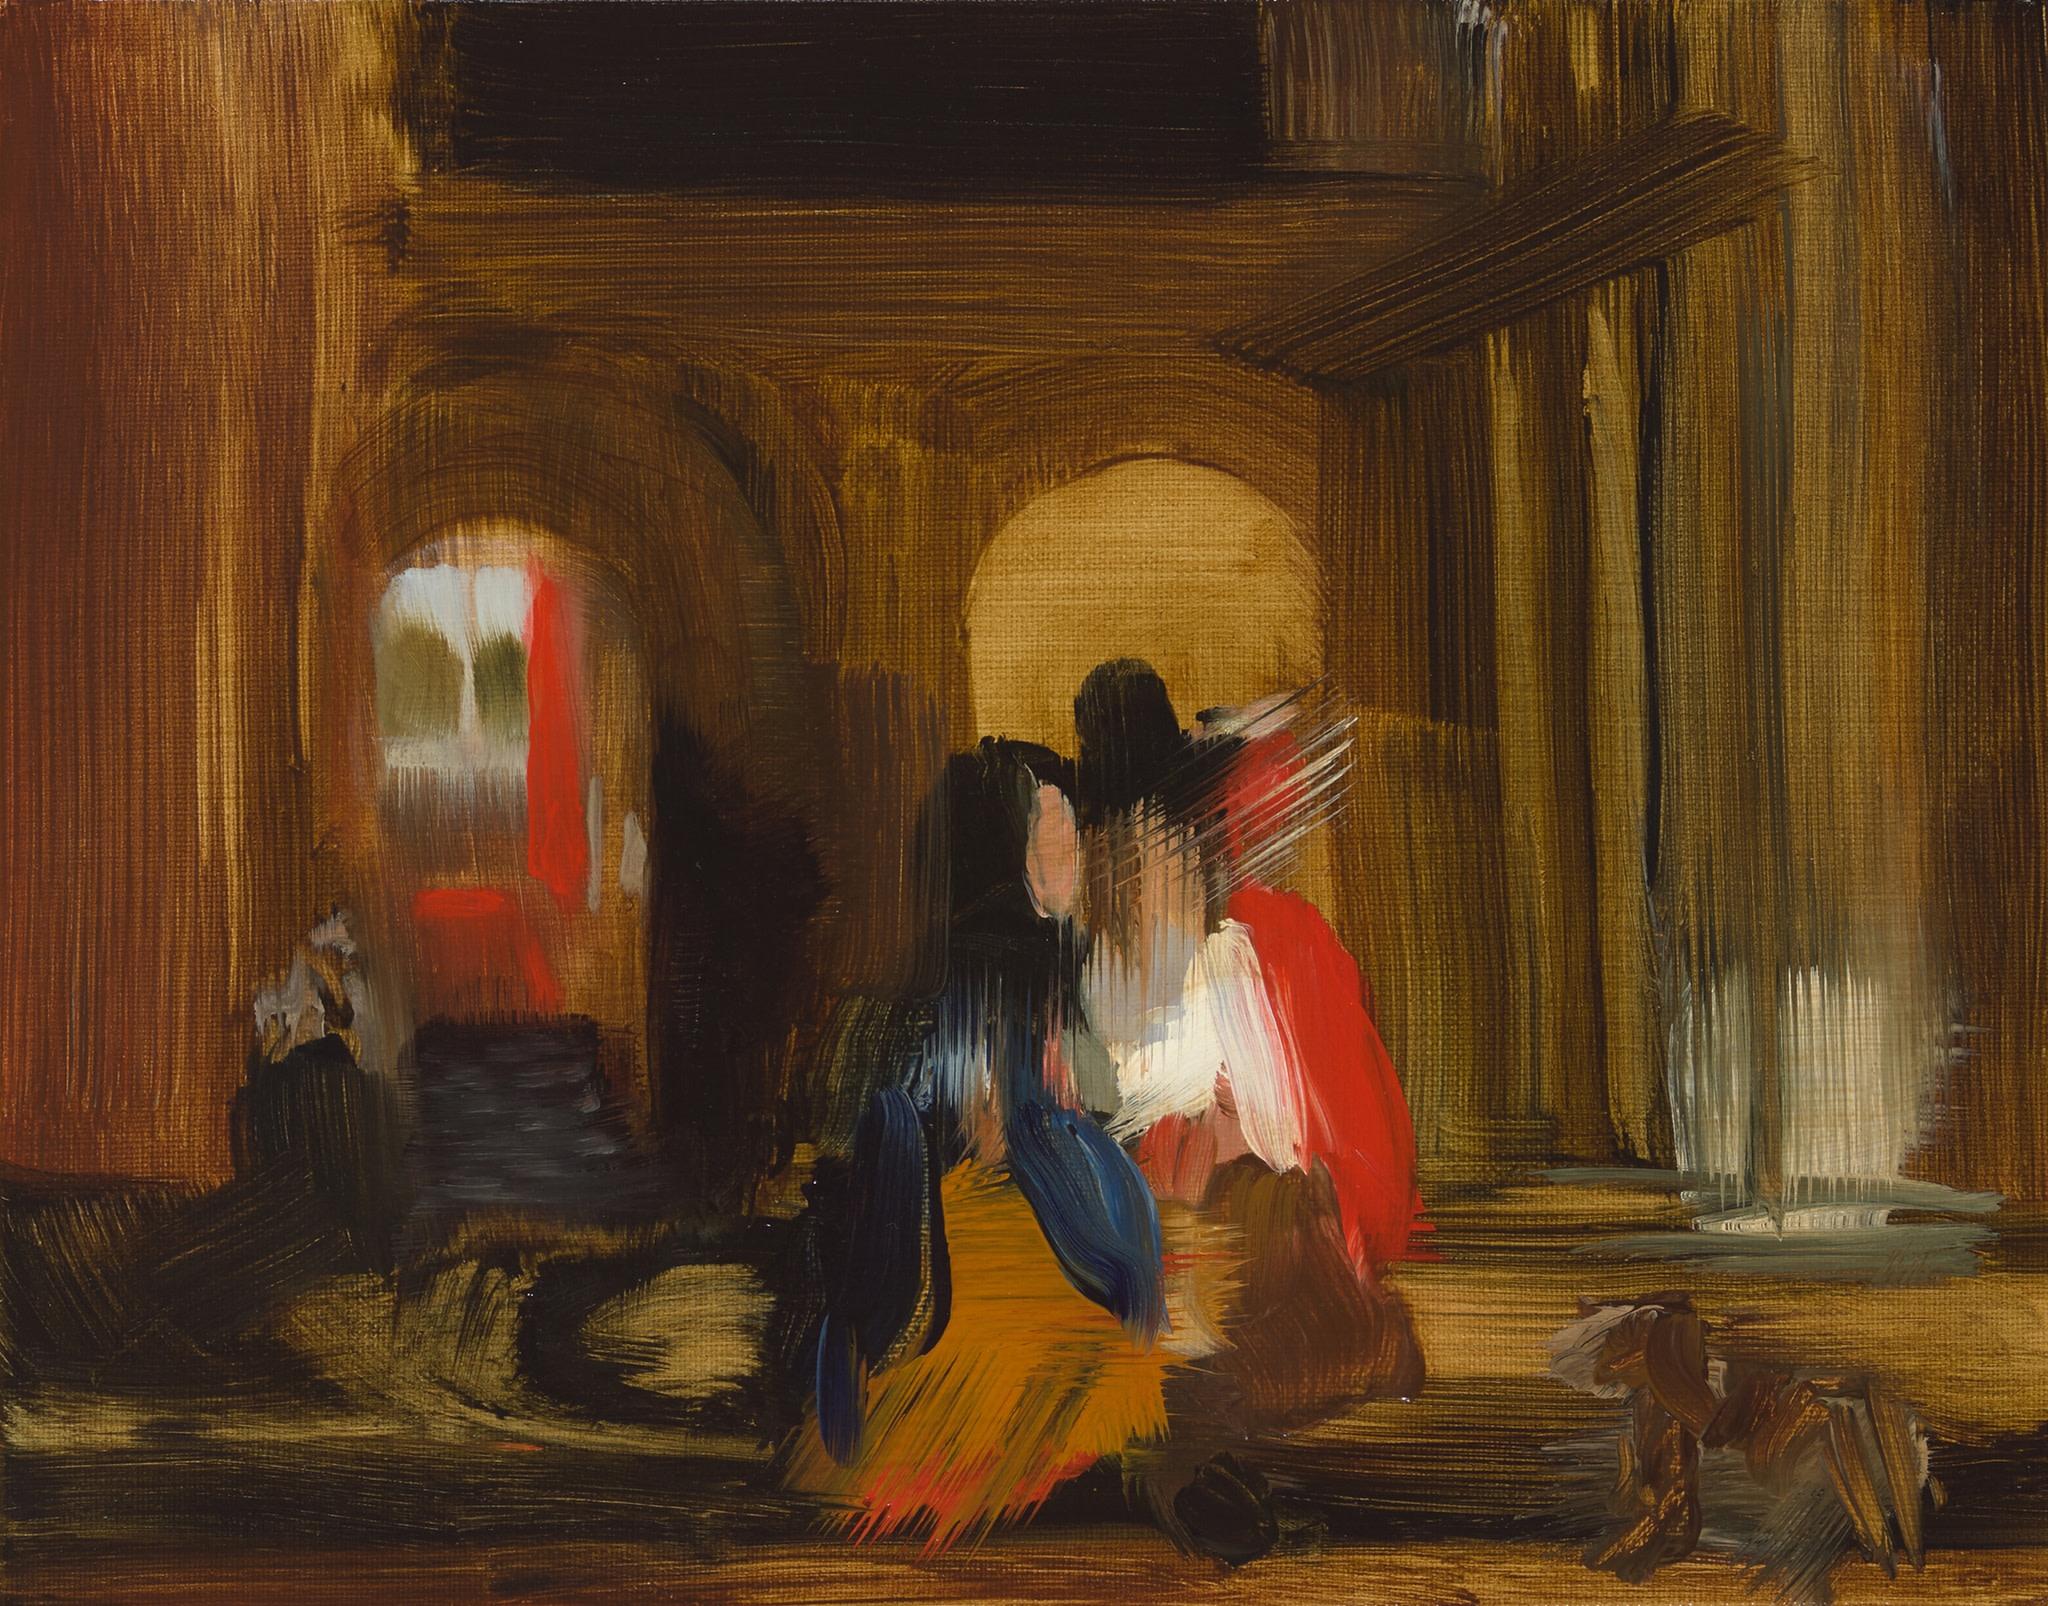 "<span class=""link fancybox-details-link""><a href=""/exhibitions/40/works/artworks113/"">View Detail Page</a></span><div class=""artist""><strong>Elise Ansel</strong></div><div class=""title""><em>Walking (after Pieter de Hooch)</em>, 2015</div><div class=""medium"">Oil on Linen</div><div class=""dimensions"">27.9 x 35.6 cm<br>11 x 14 in.</div>"